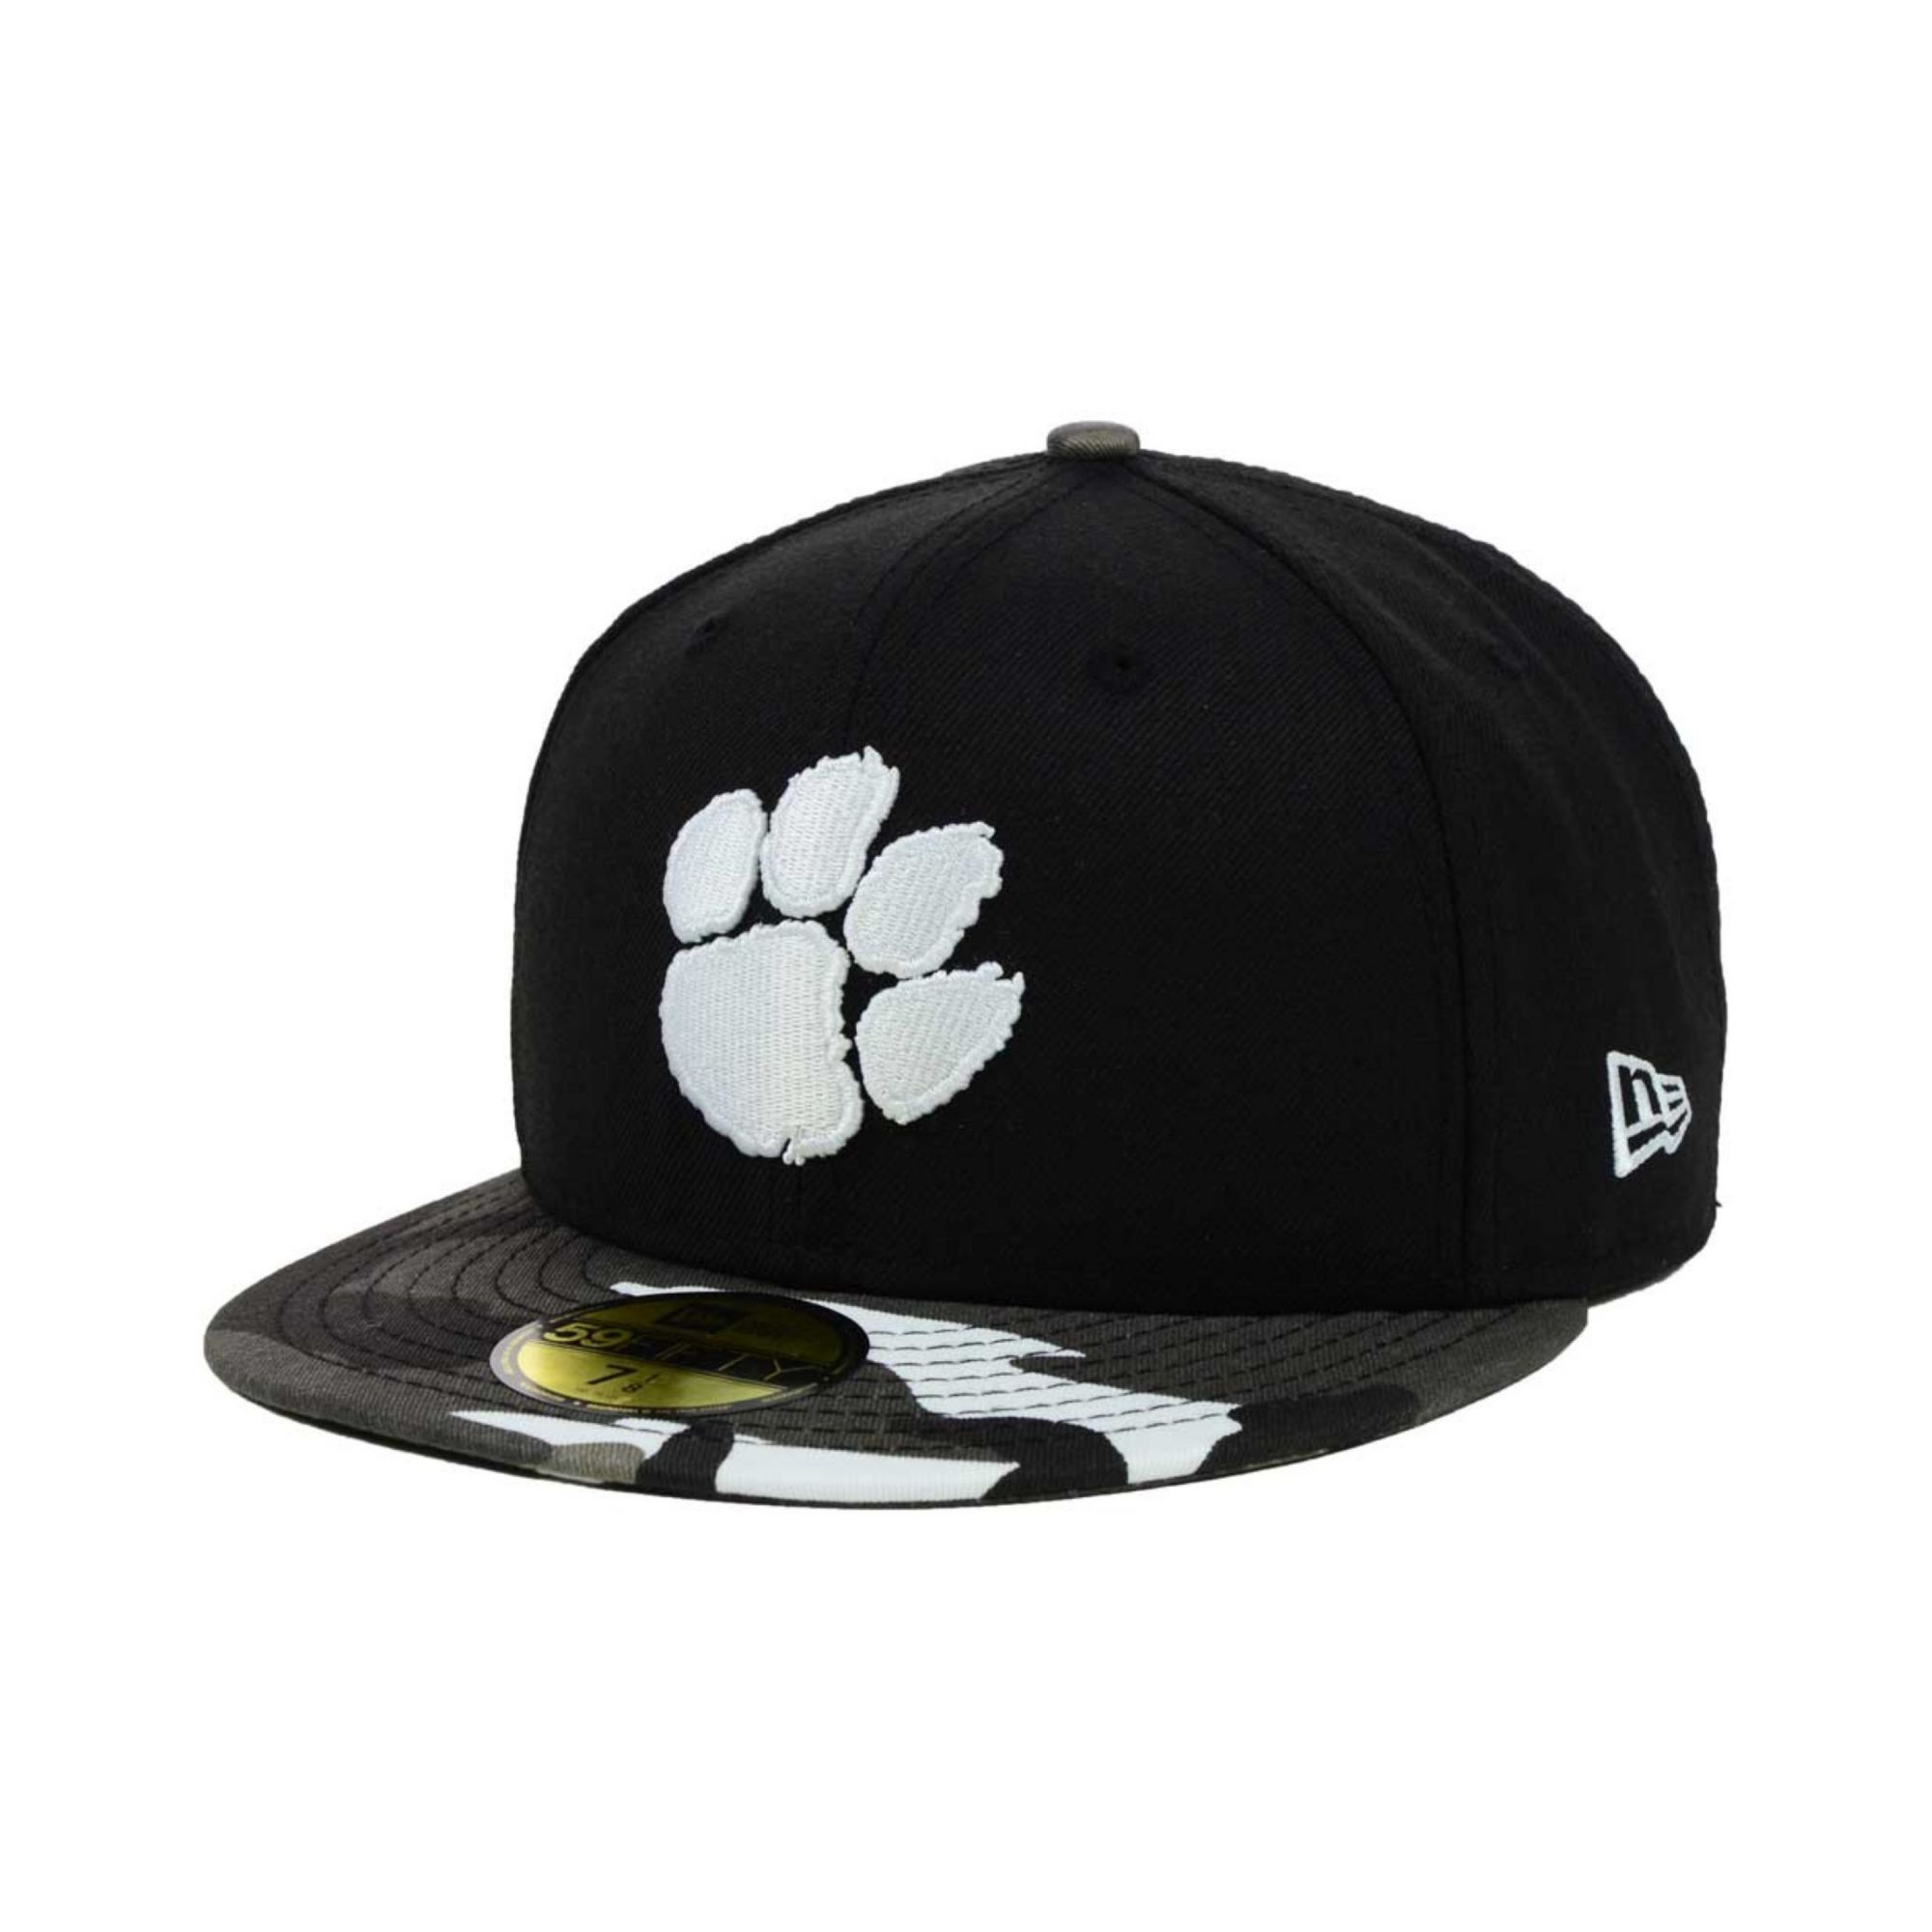 best service 65ab9 fd04f ... shopping lyst ktz clemson tigers urban camo 59fifty cap in black for  men d6301 70e16